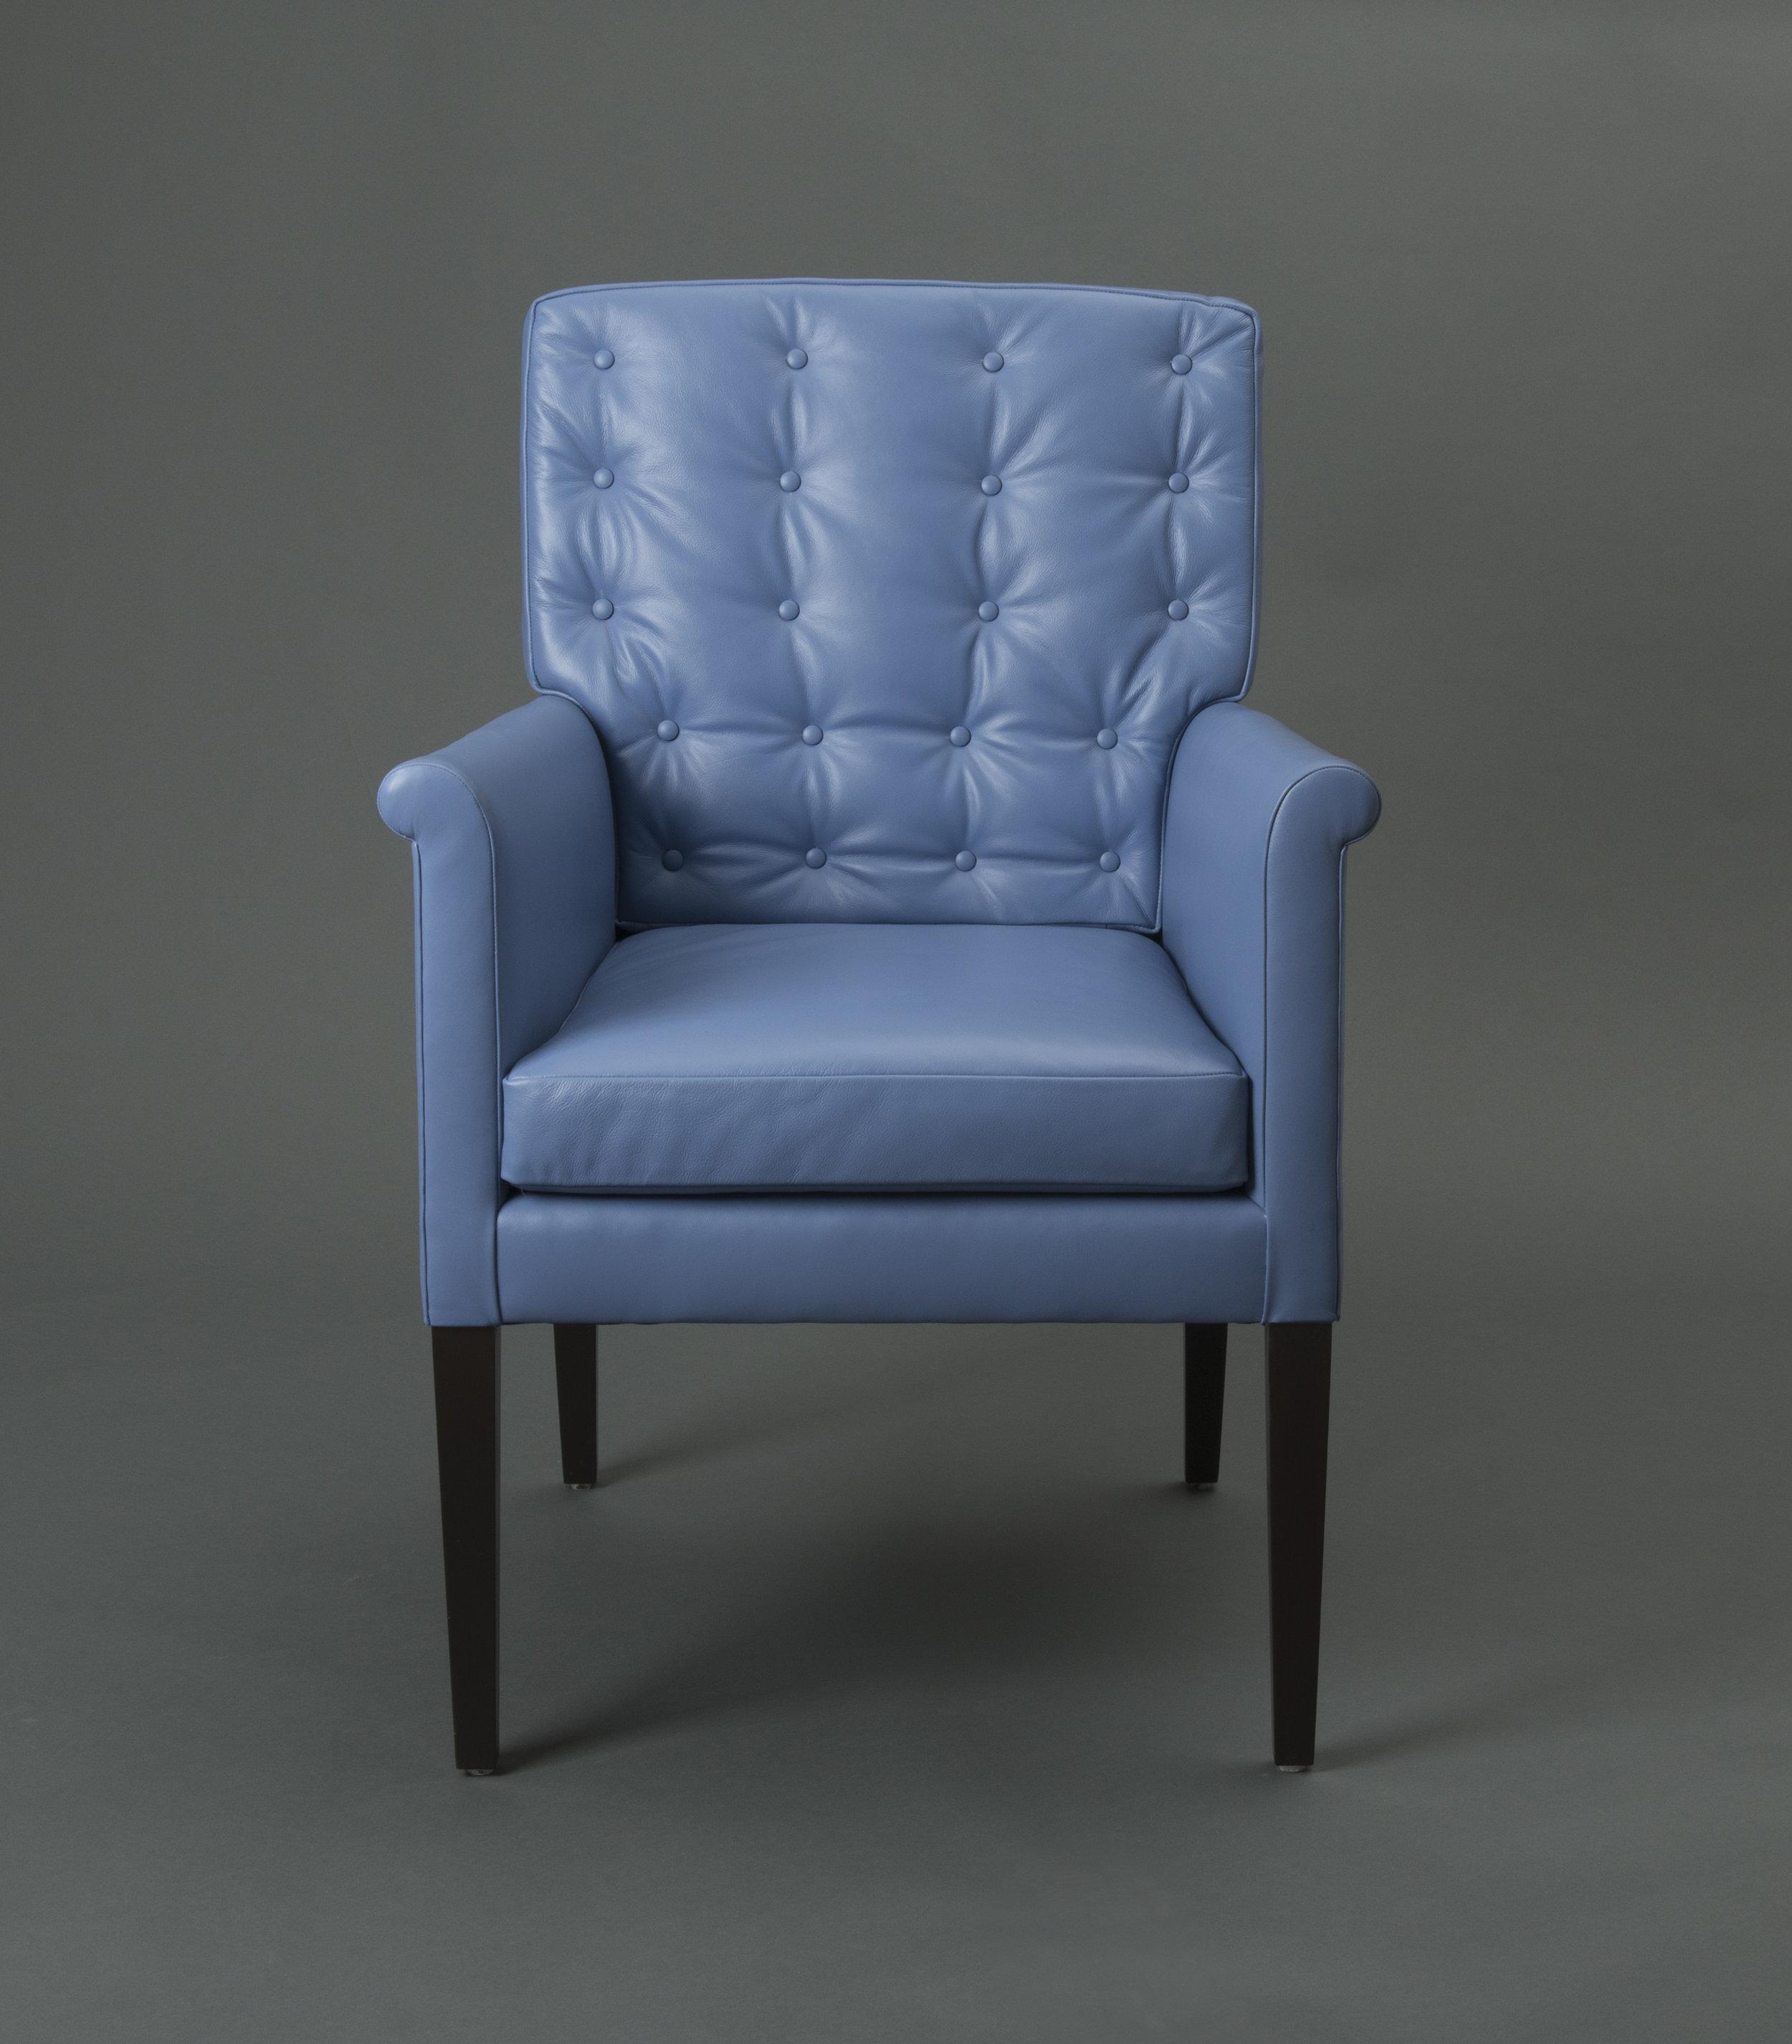 montgomery_chair2.jpg